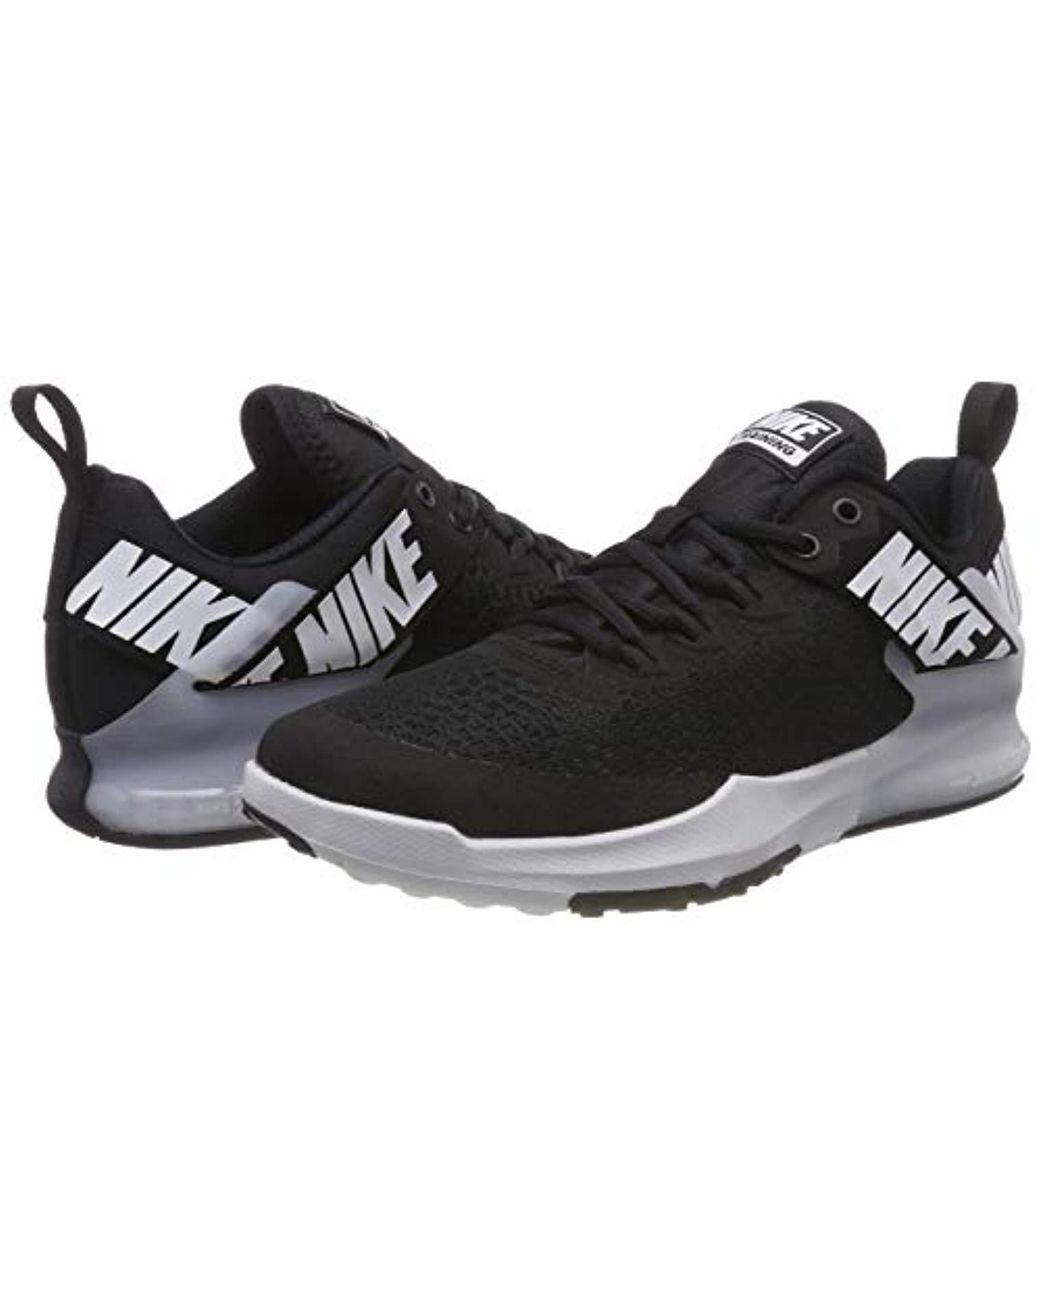 c27ec73d6316c6 Nike Zoom Domination Tr 2 Gymnastics Shoes in Black for Men - Lyst